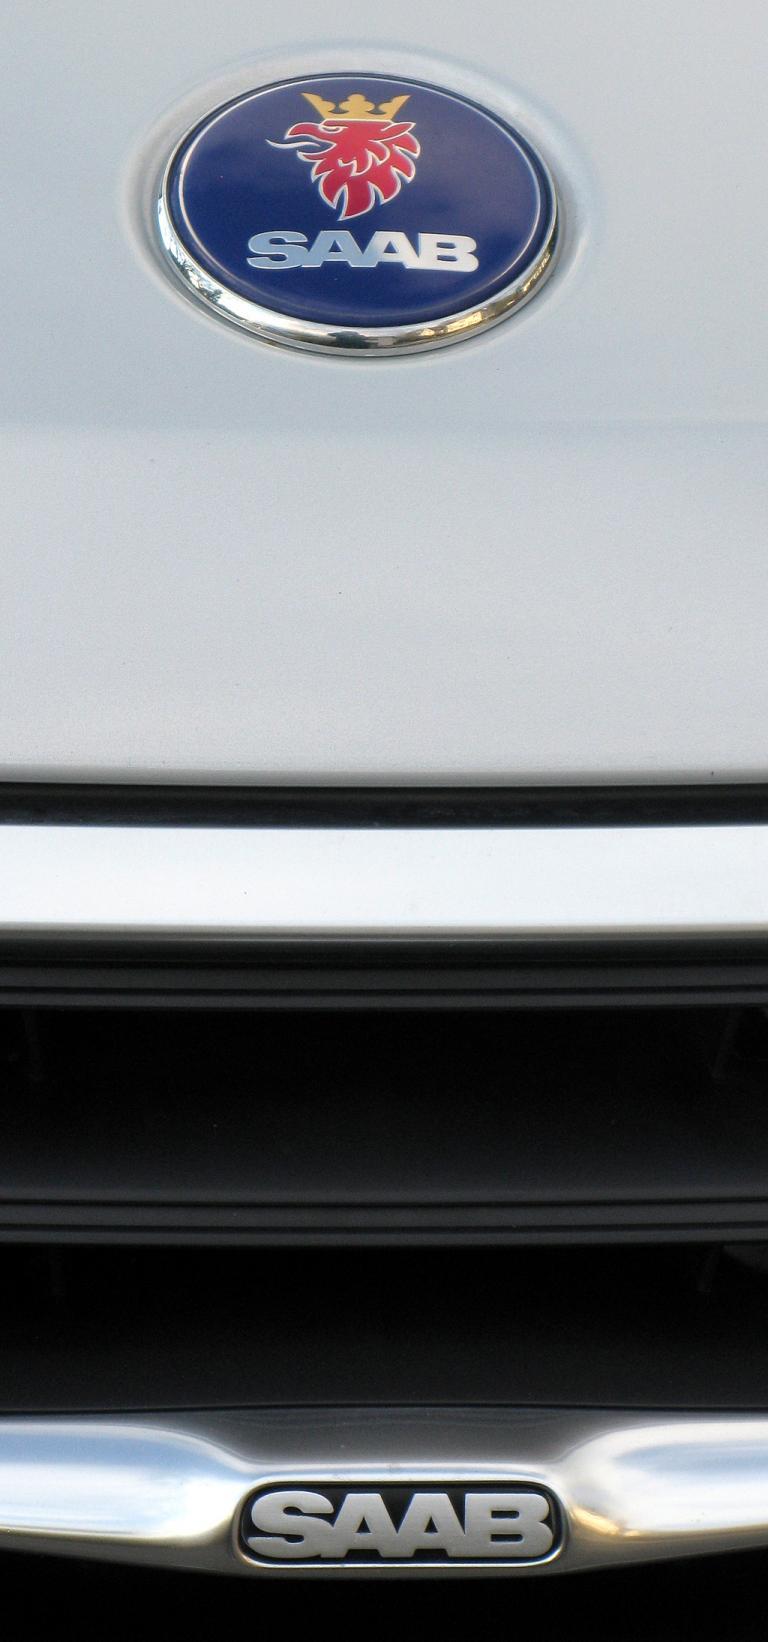 Saab 9-3: Kühlergrill mit Emblem auf der Motorhaube.